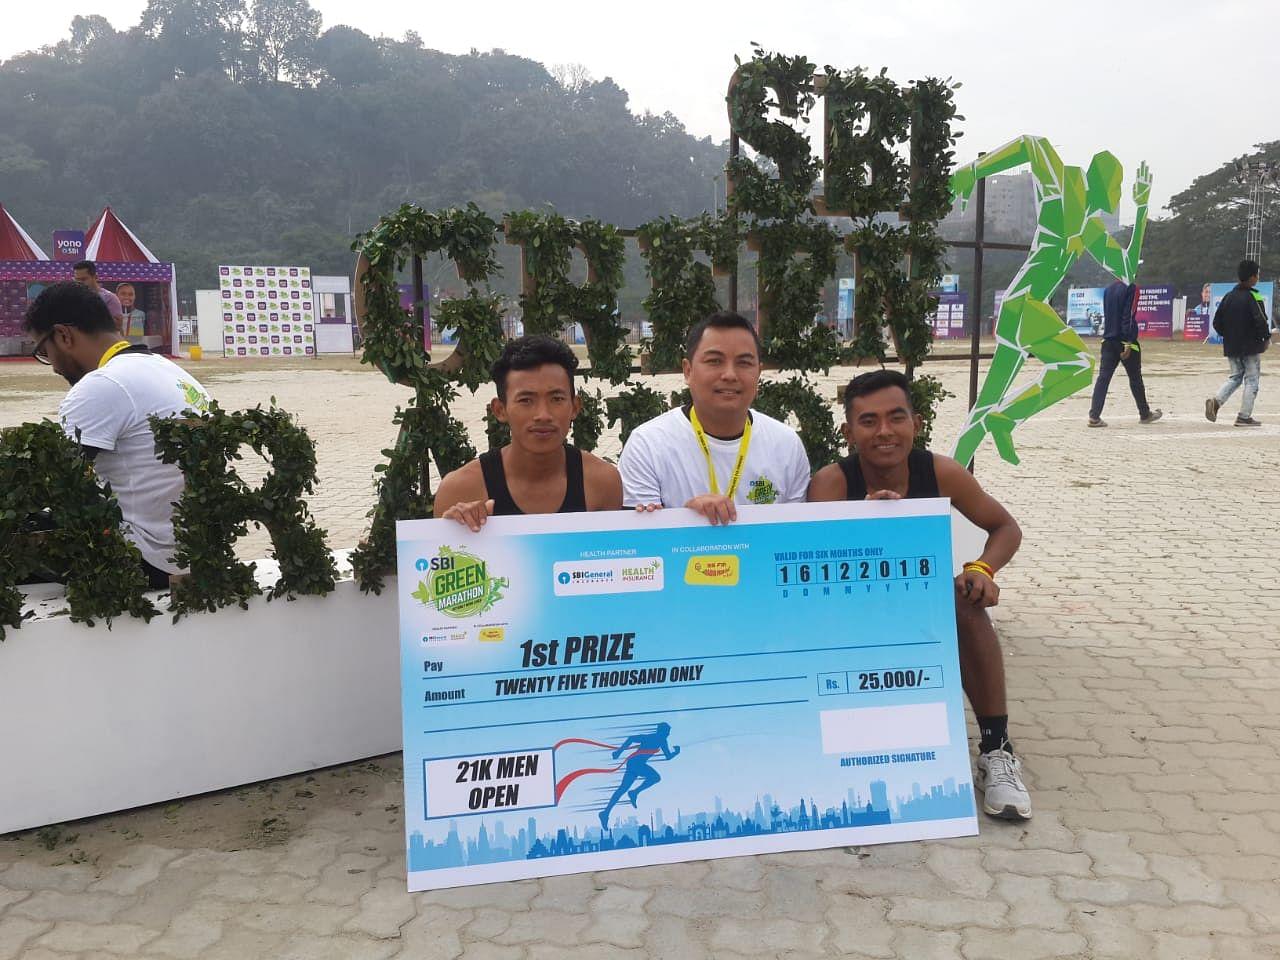 Batsrang Sangma (Extreme Left), won the 2018 Guwahati Half Marathon.